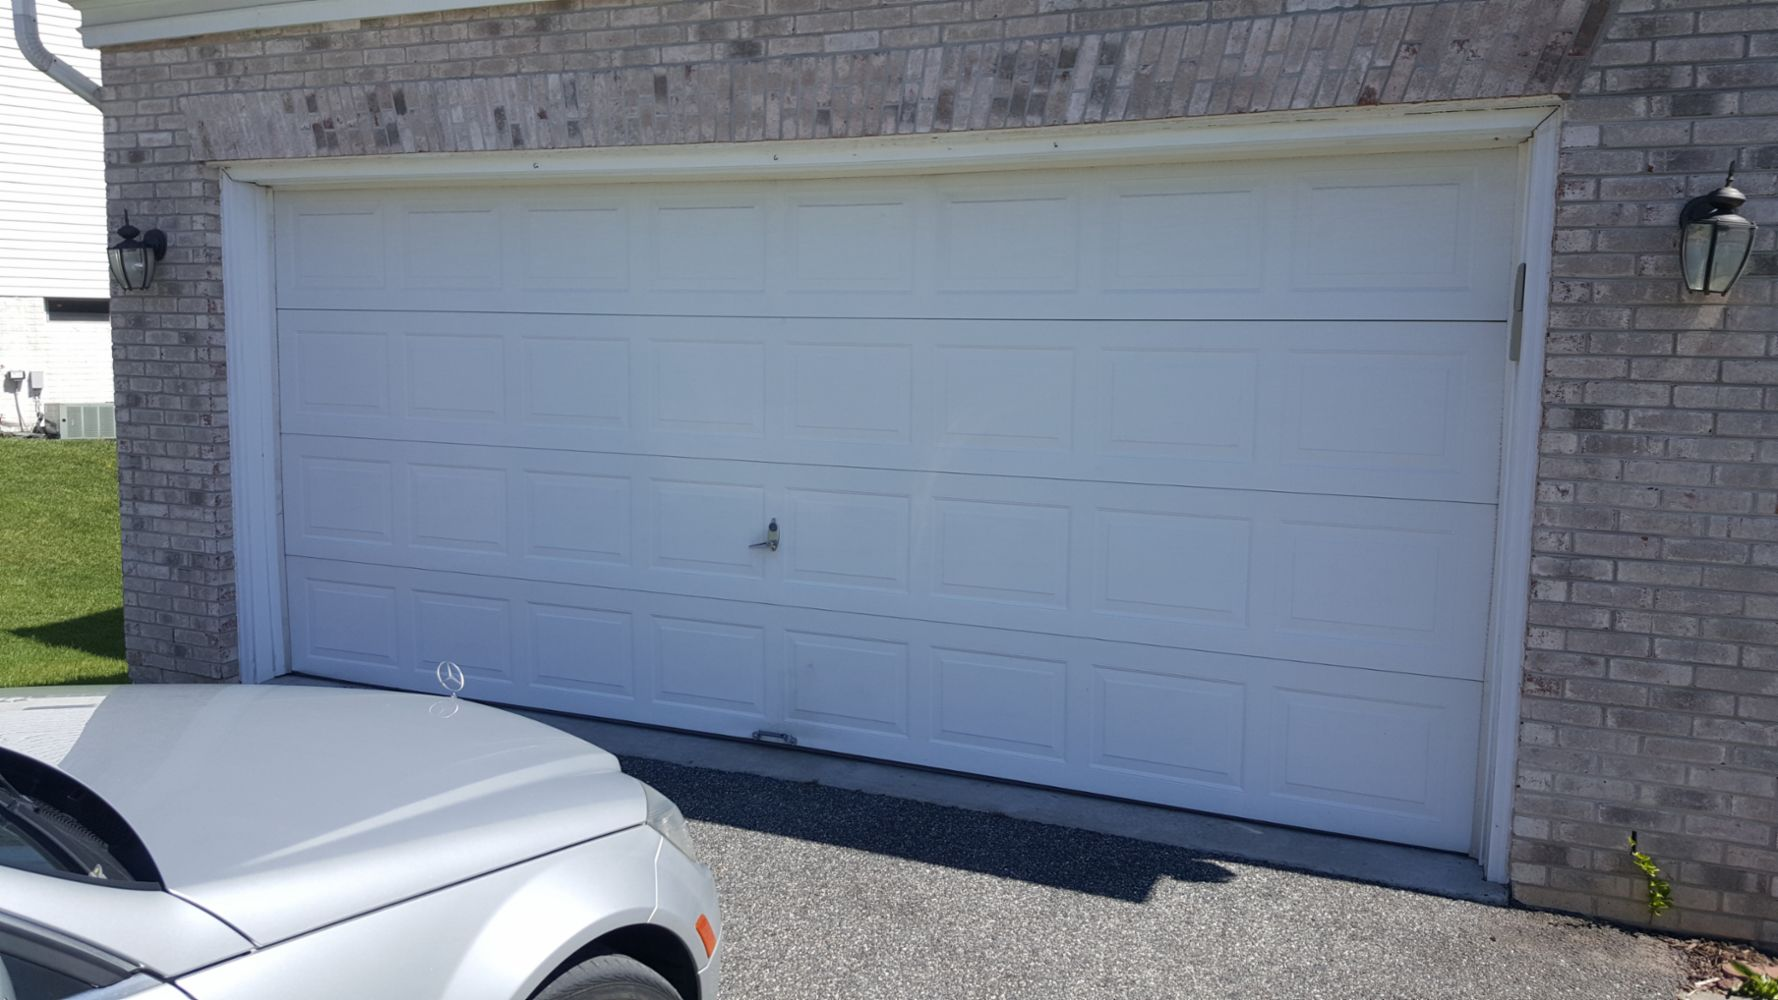 1000 #6F7C41 24H Garage Door Repair & Gate Reapir Company In Washington DC All  picture/photo Garage Doors Companies 36091778